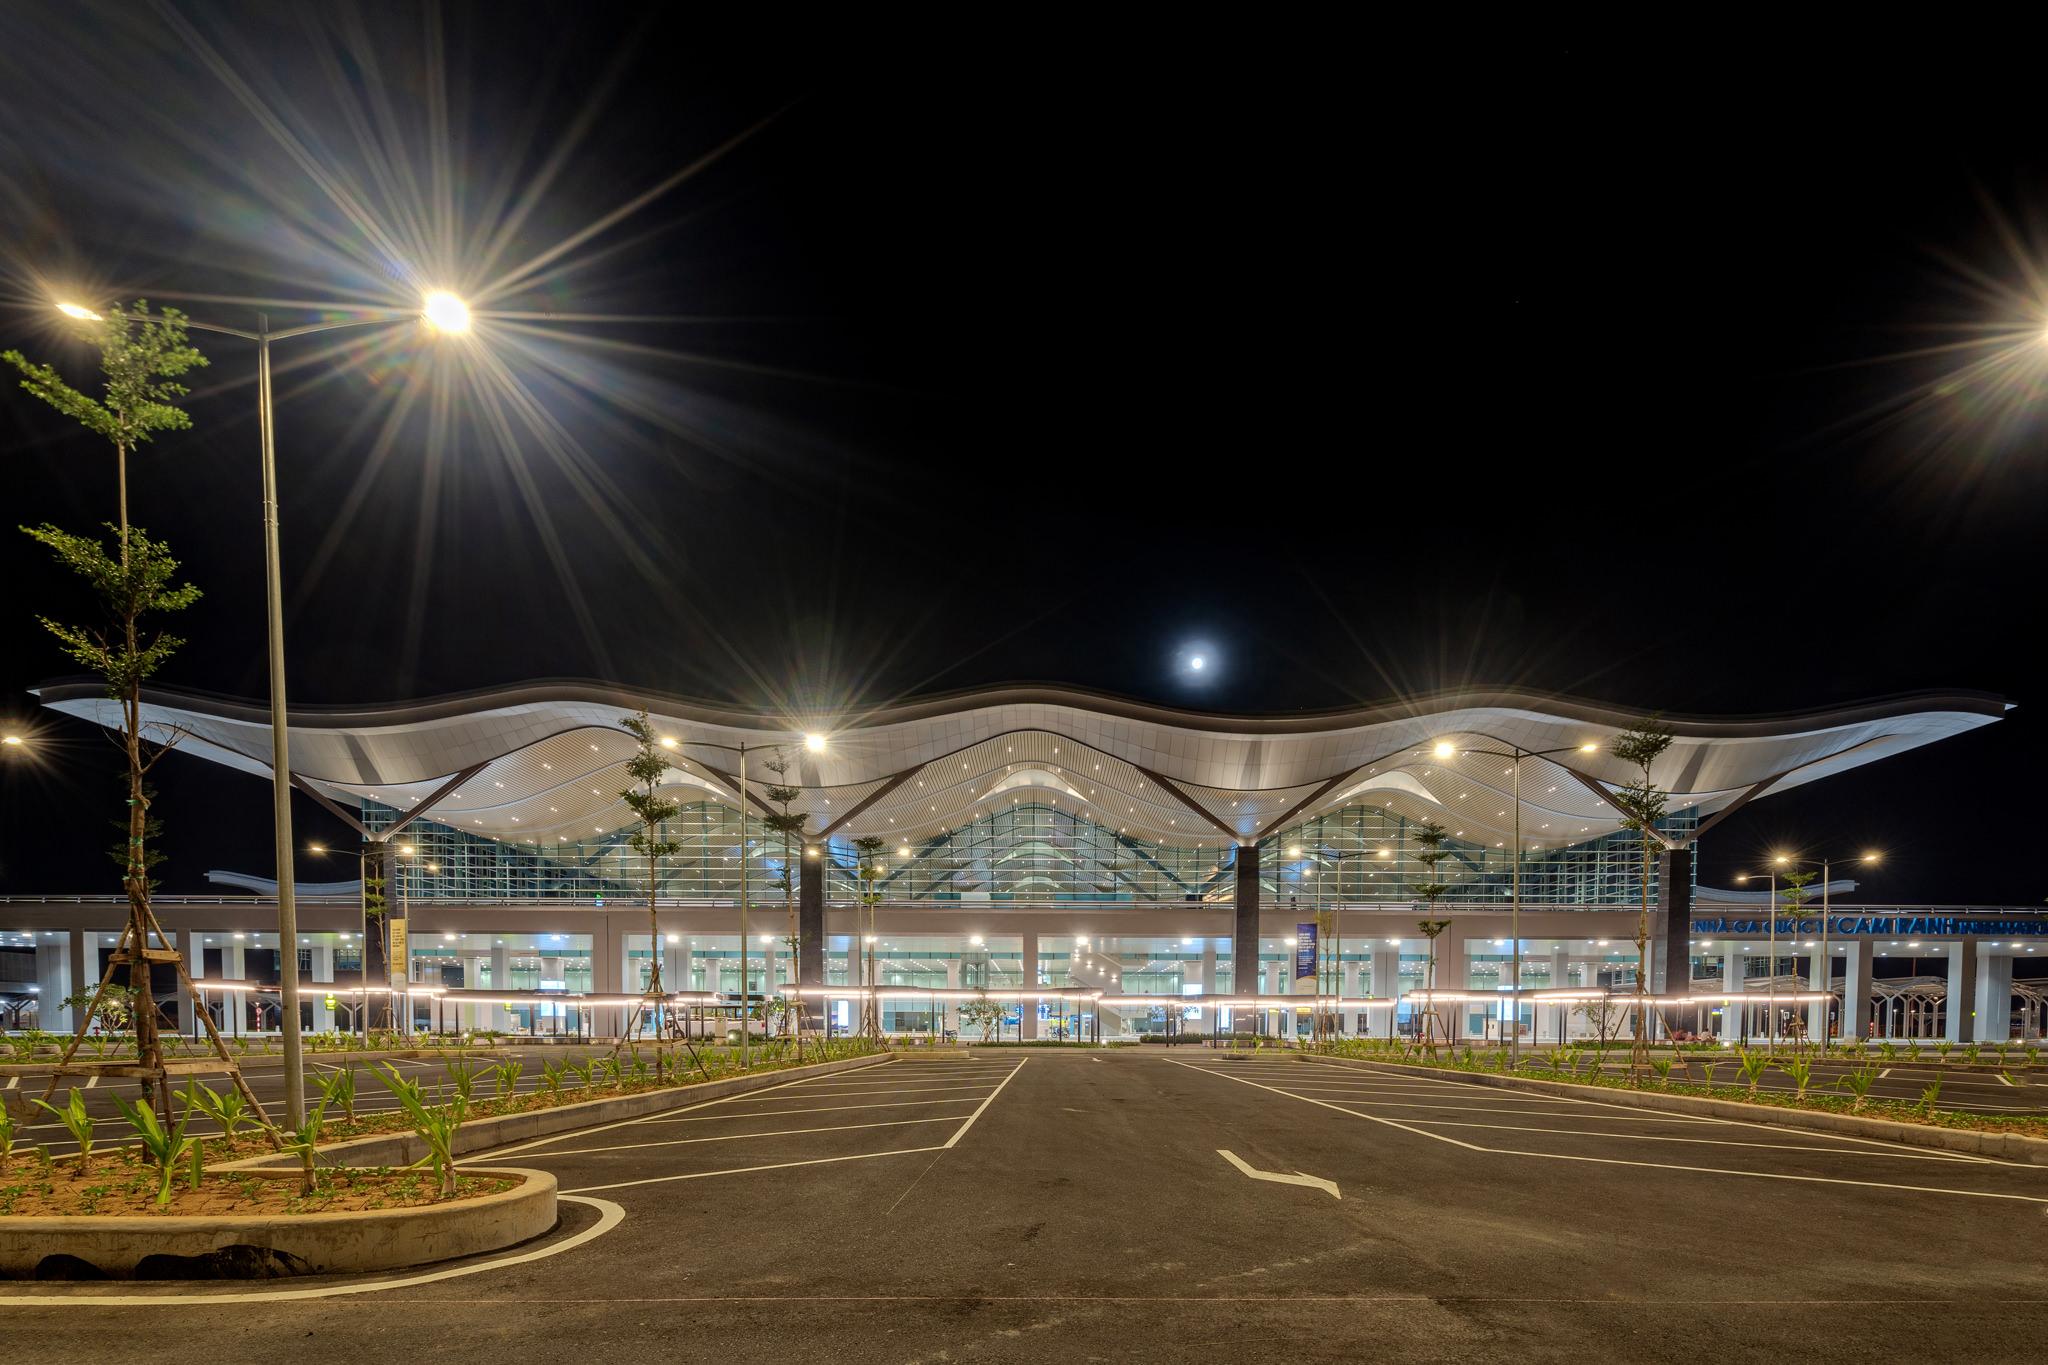 20180626 - Cam Ranh Airport - Architecture - 0394.jpg